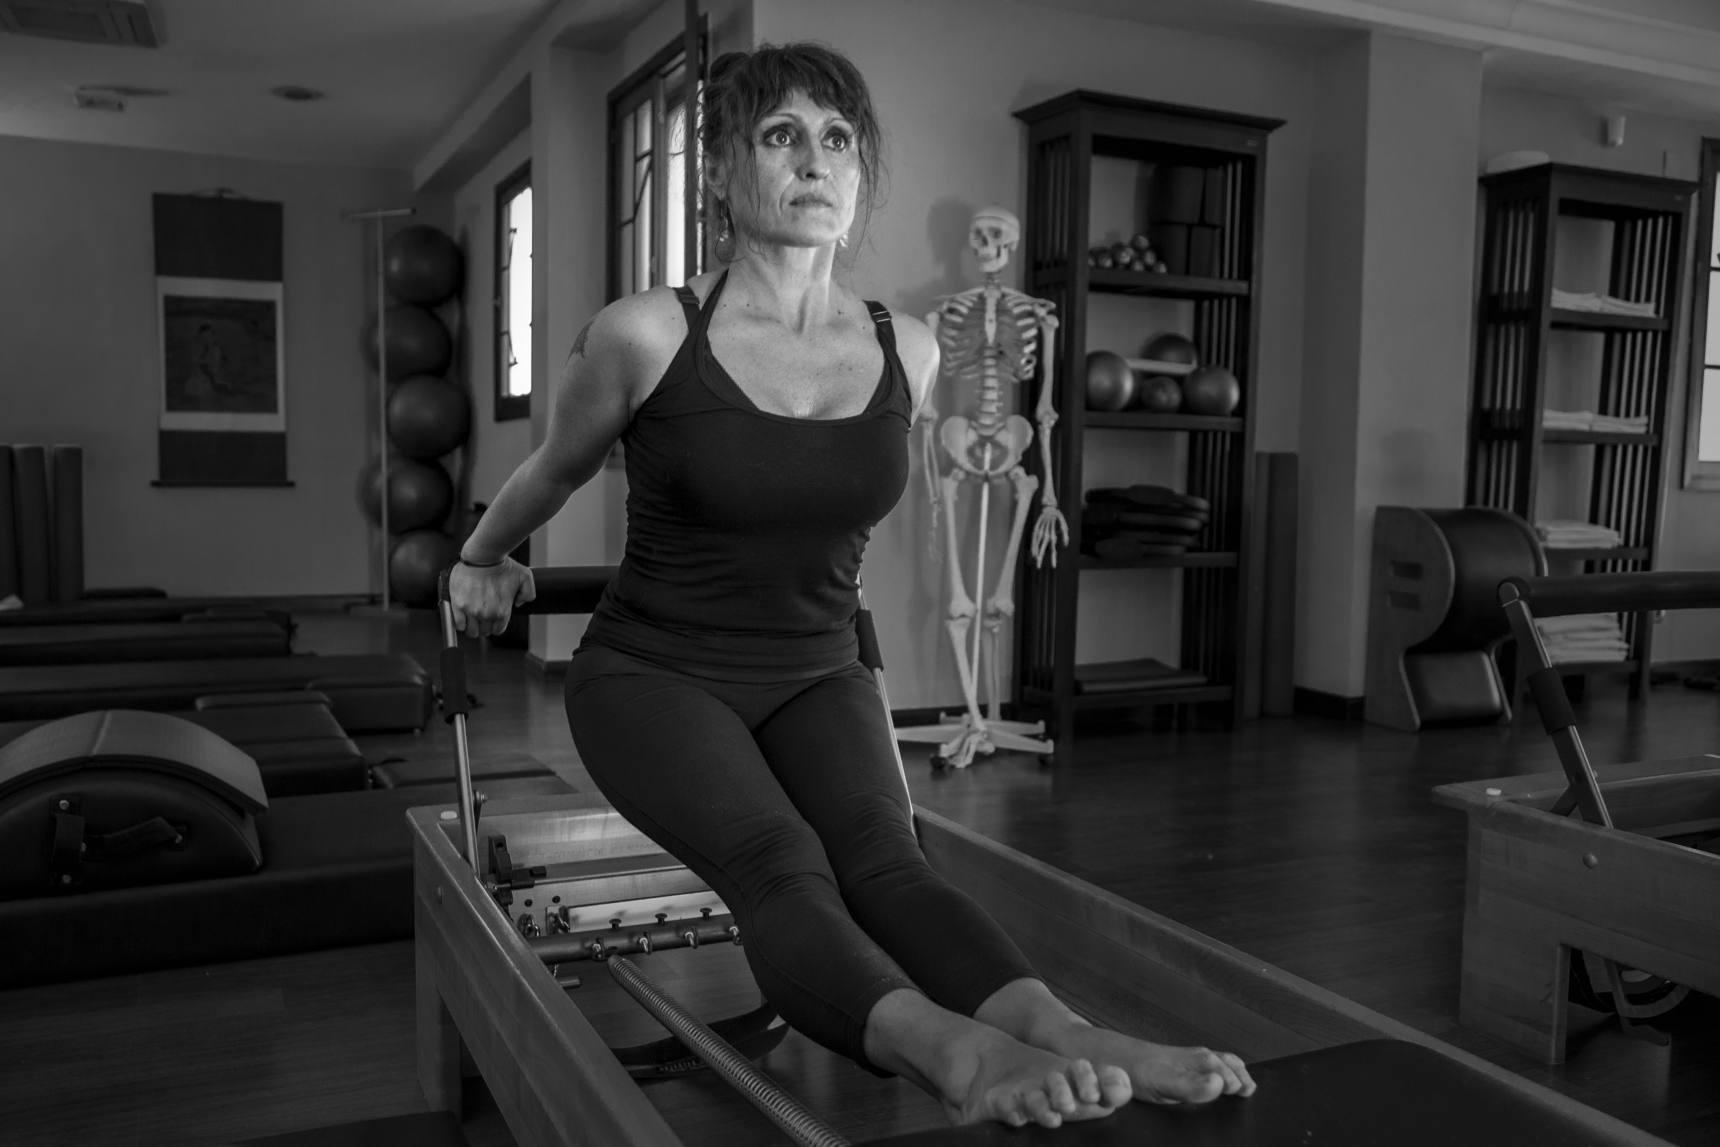 """12 Frases de Joseph Pilates que quizá te ayuden a entender mejor el método Pilates"""